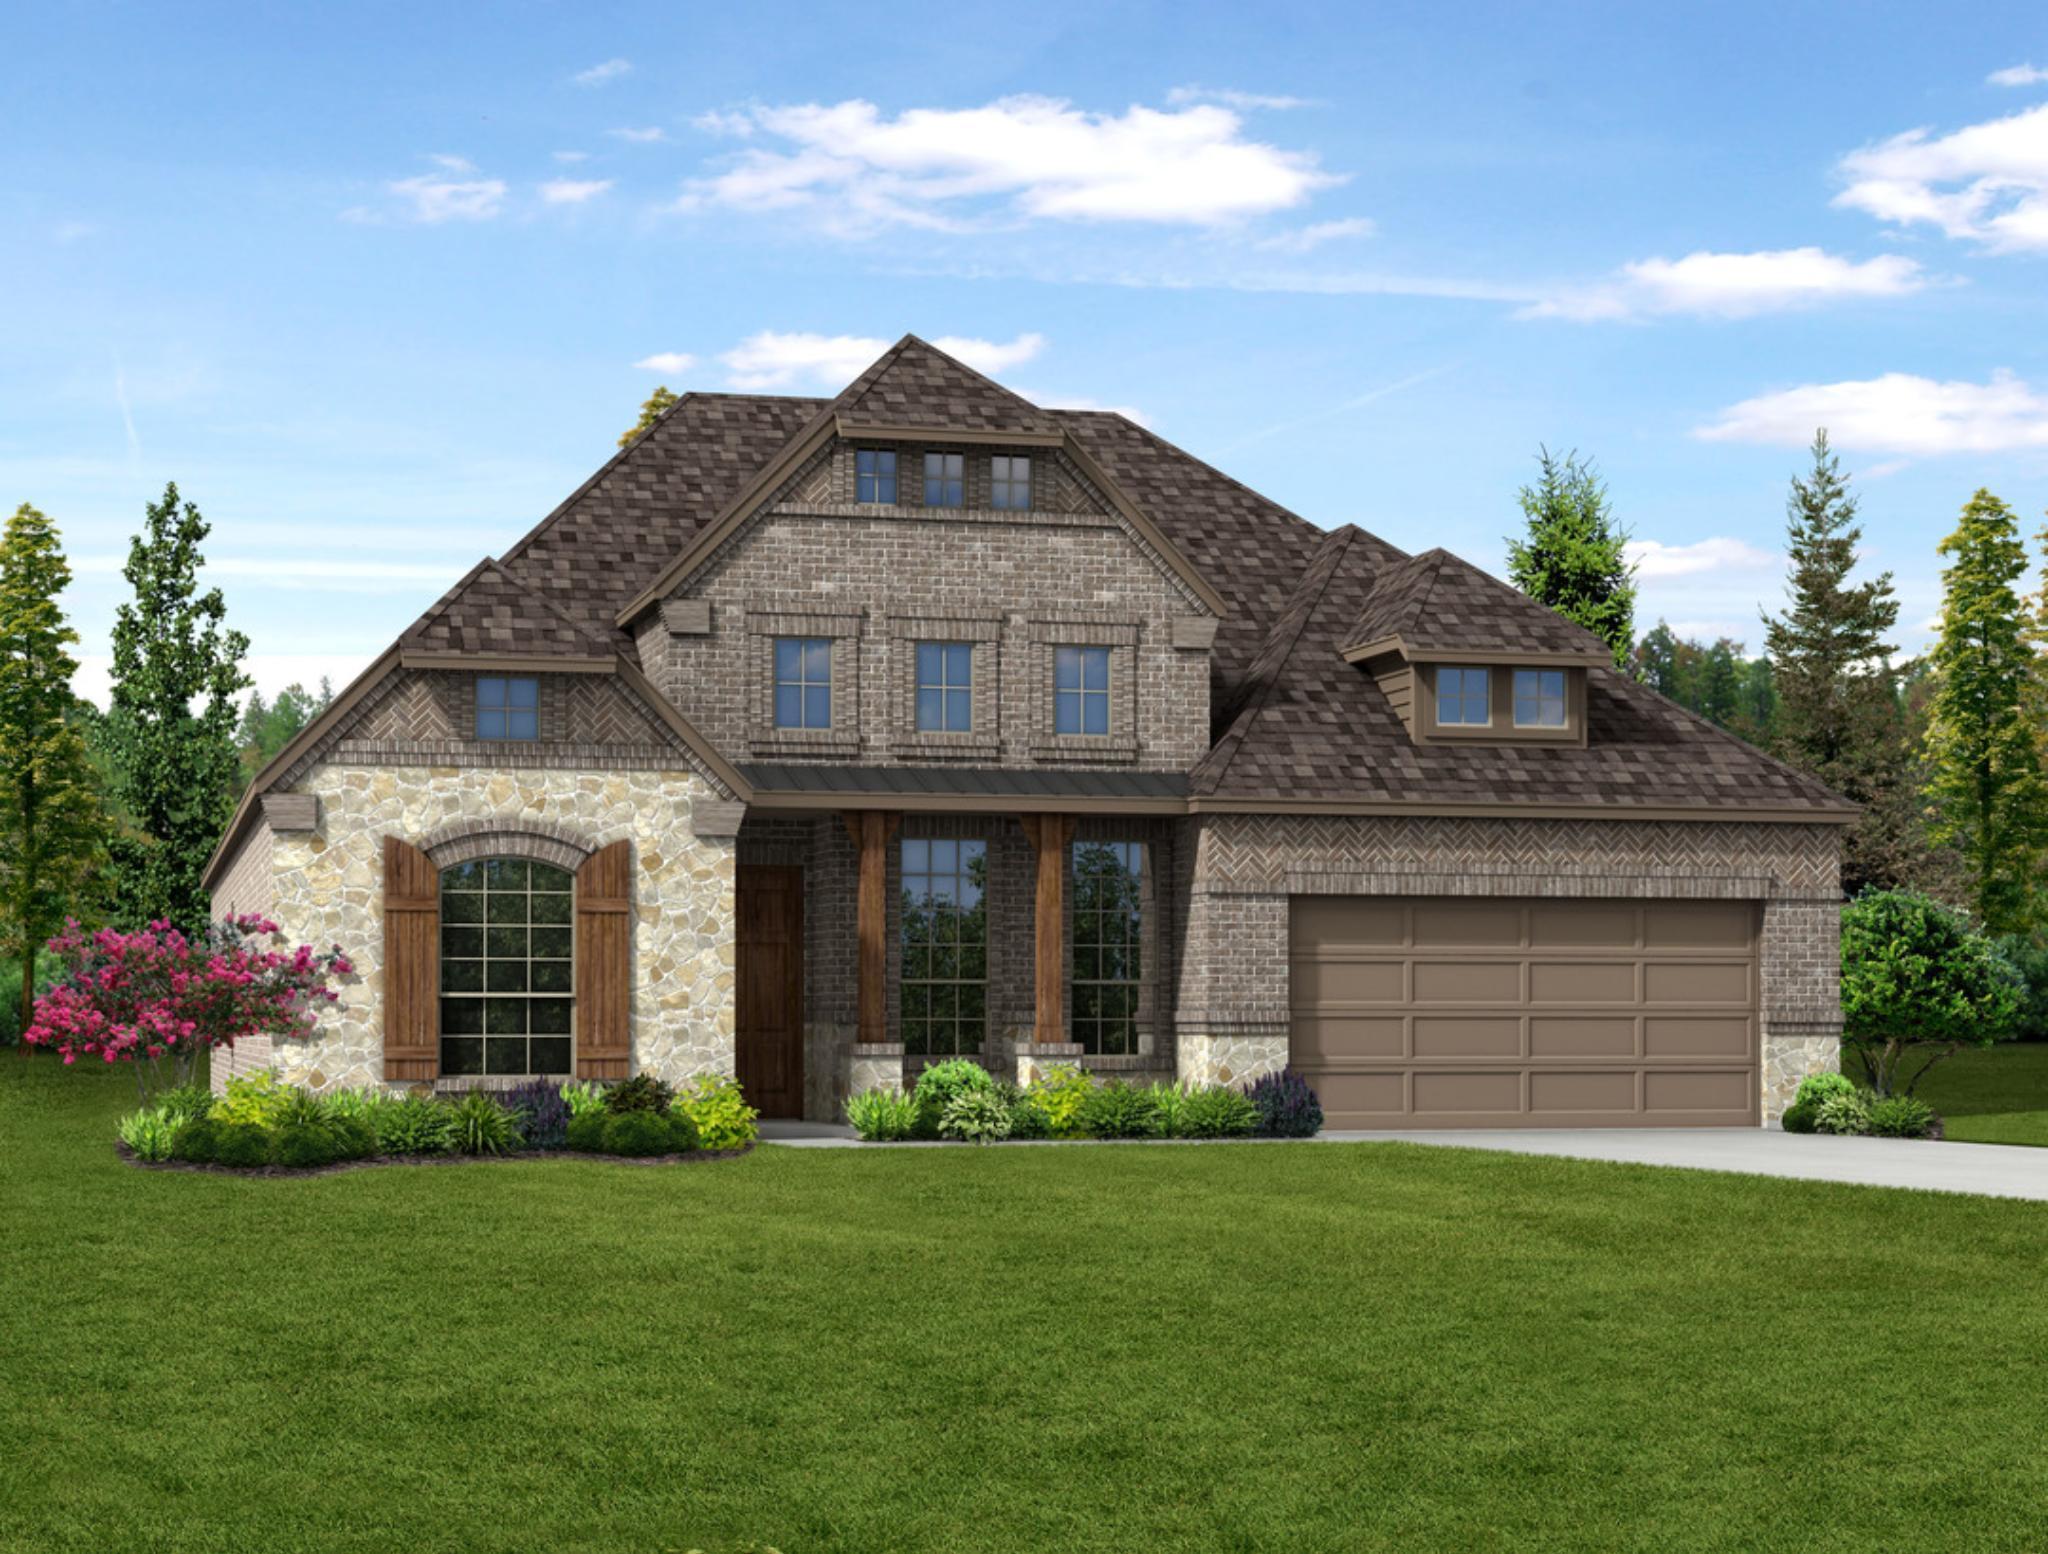 http://partners-dynamic.bdxcdn.com/Images/Homes/TrendmakerHomes/max1500_37619114-190903.jpg